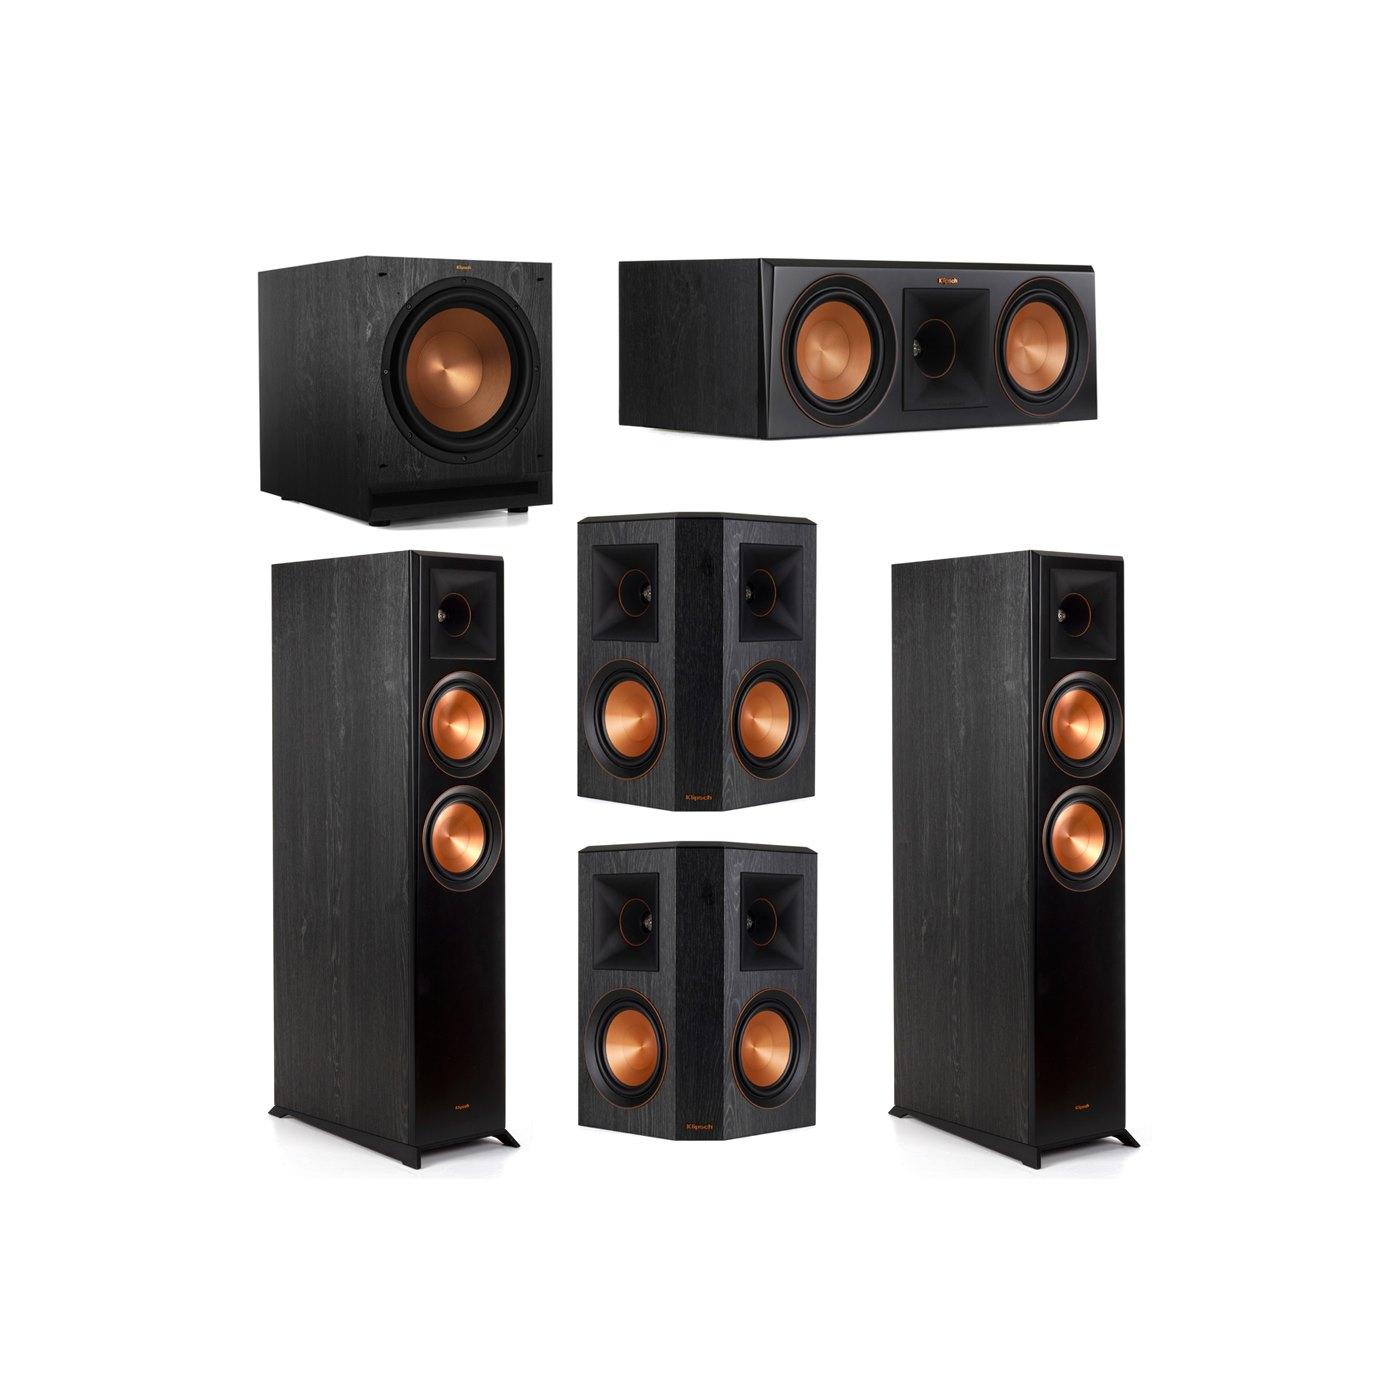 Klipsch 5.1 System with 2 RP-6000F Floorstanding Speakers, 1 Klipsch RP-600C Center Speaker, 2 Klipsch RP-502S Surround Speakers, 1 Klipsch SPL-120 Subwoofer